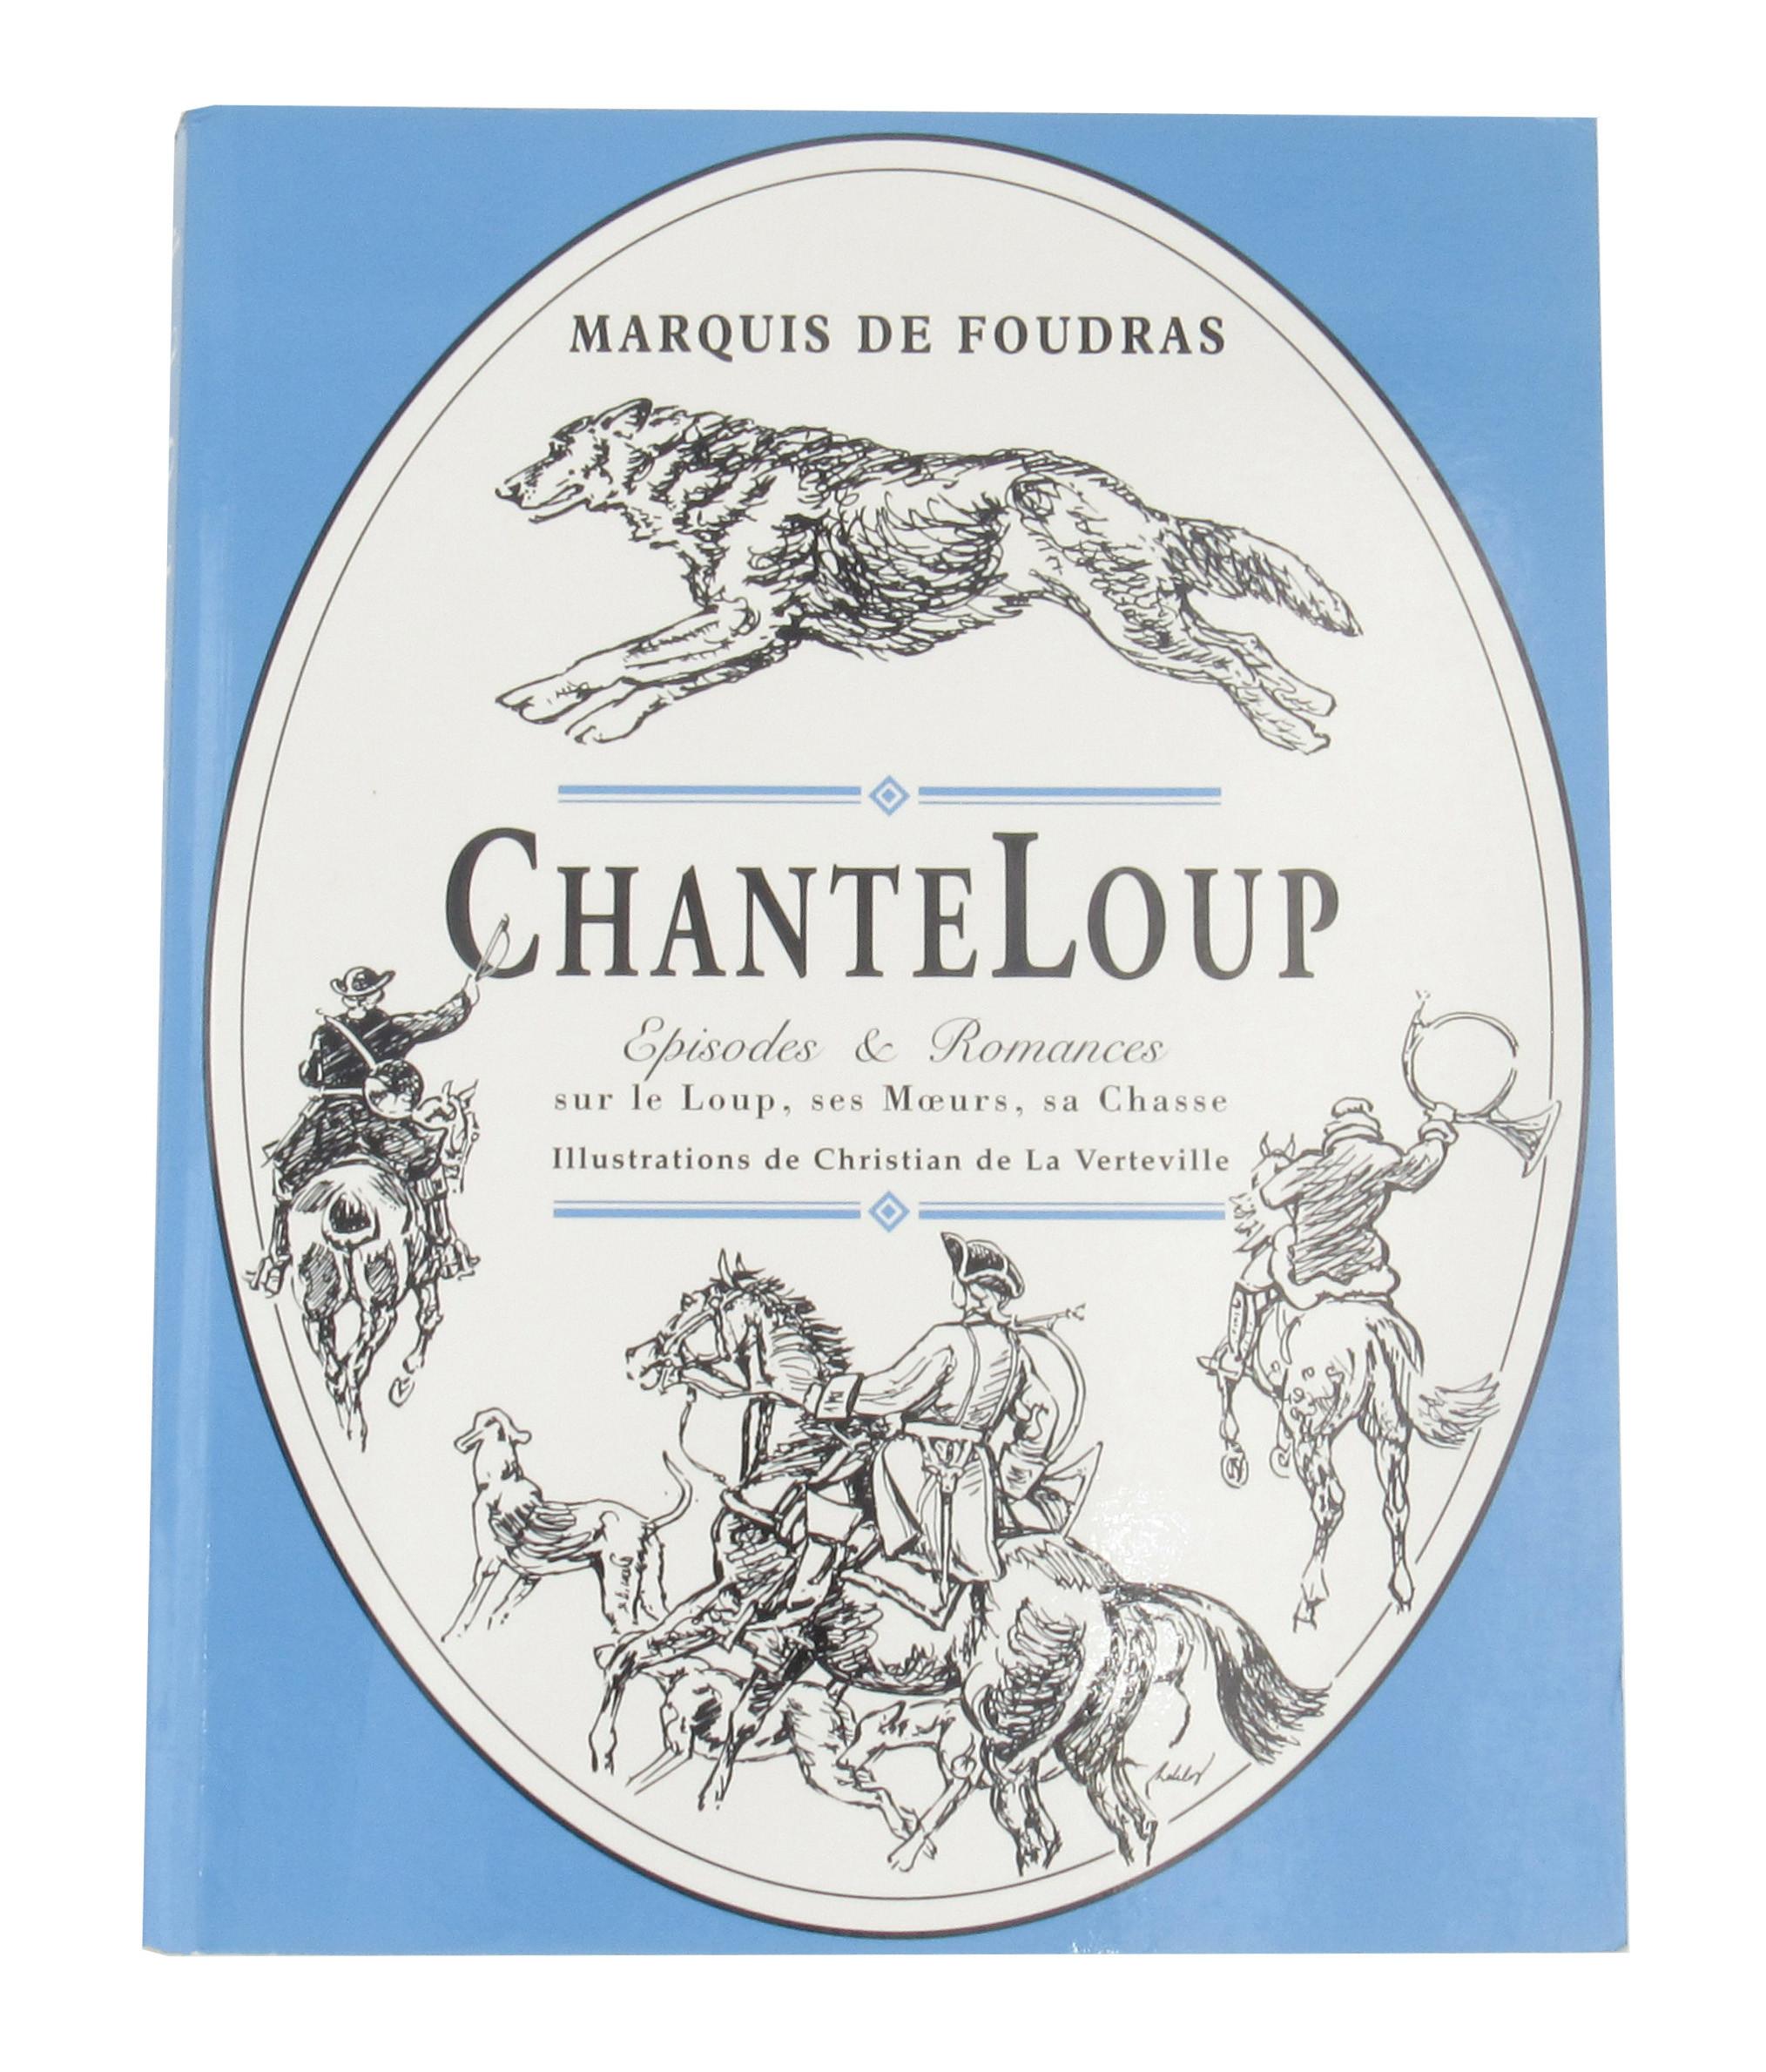 Livre Chanteloup - Marquis de Foudras